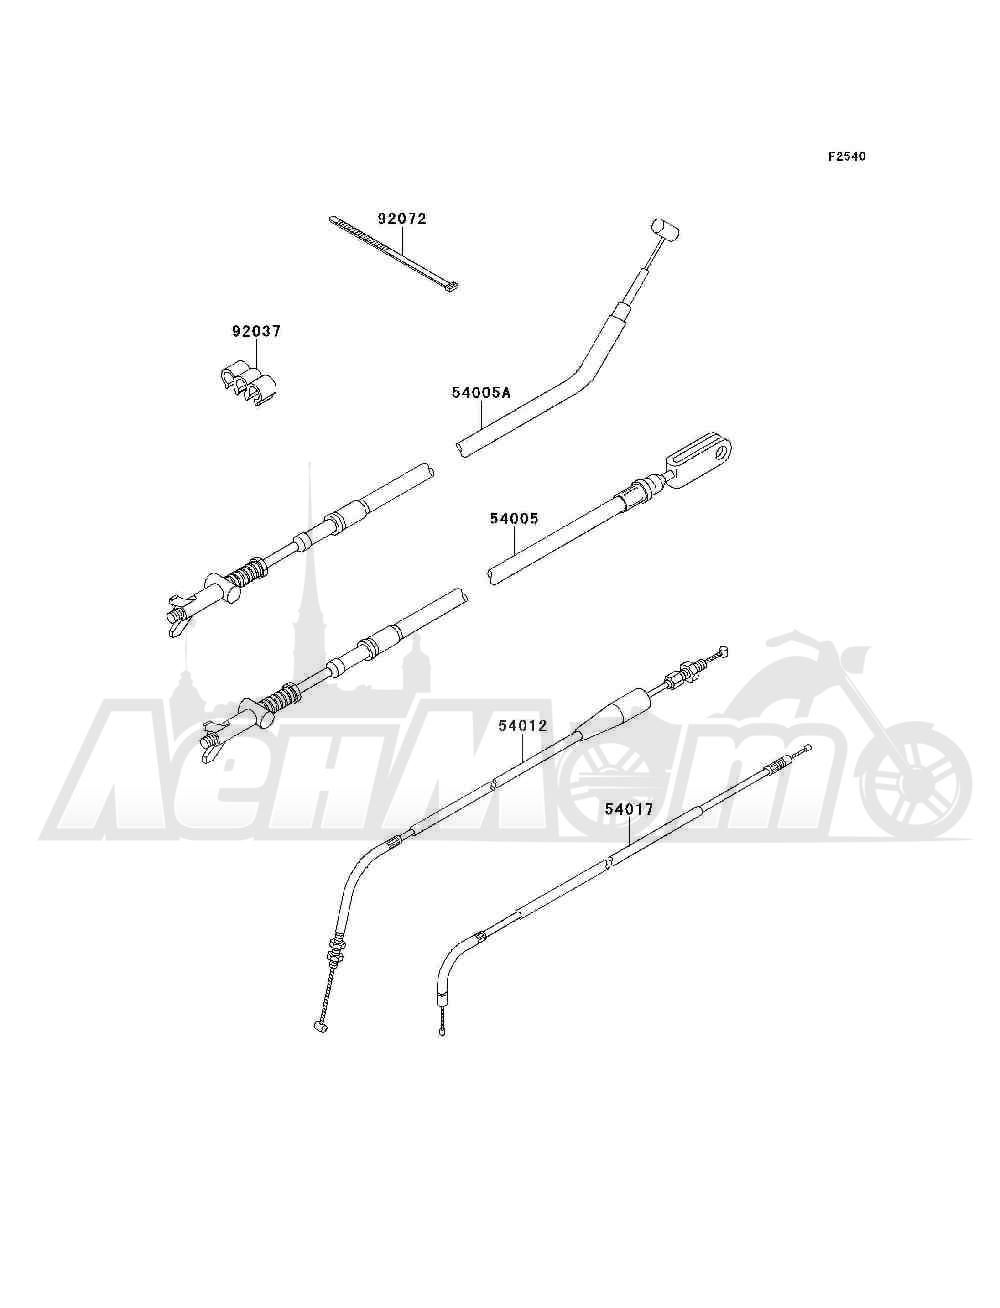 Запчасти для Квадроцикла Kawasaki 1994 BAYOU 300 4X4 (KLF300-C6) Раздел: CABLES   тросики, кабели